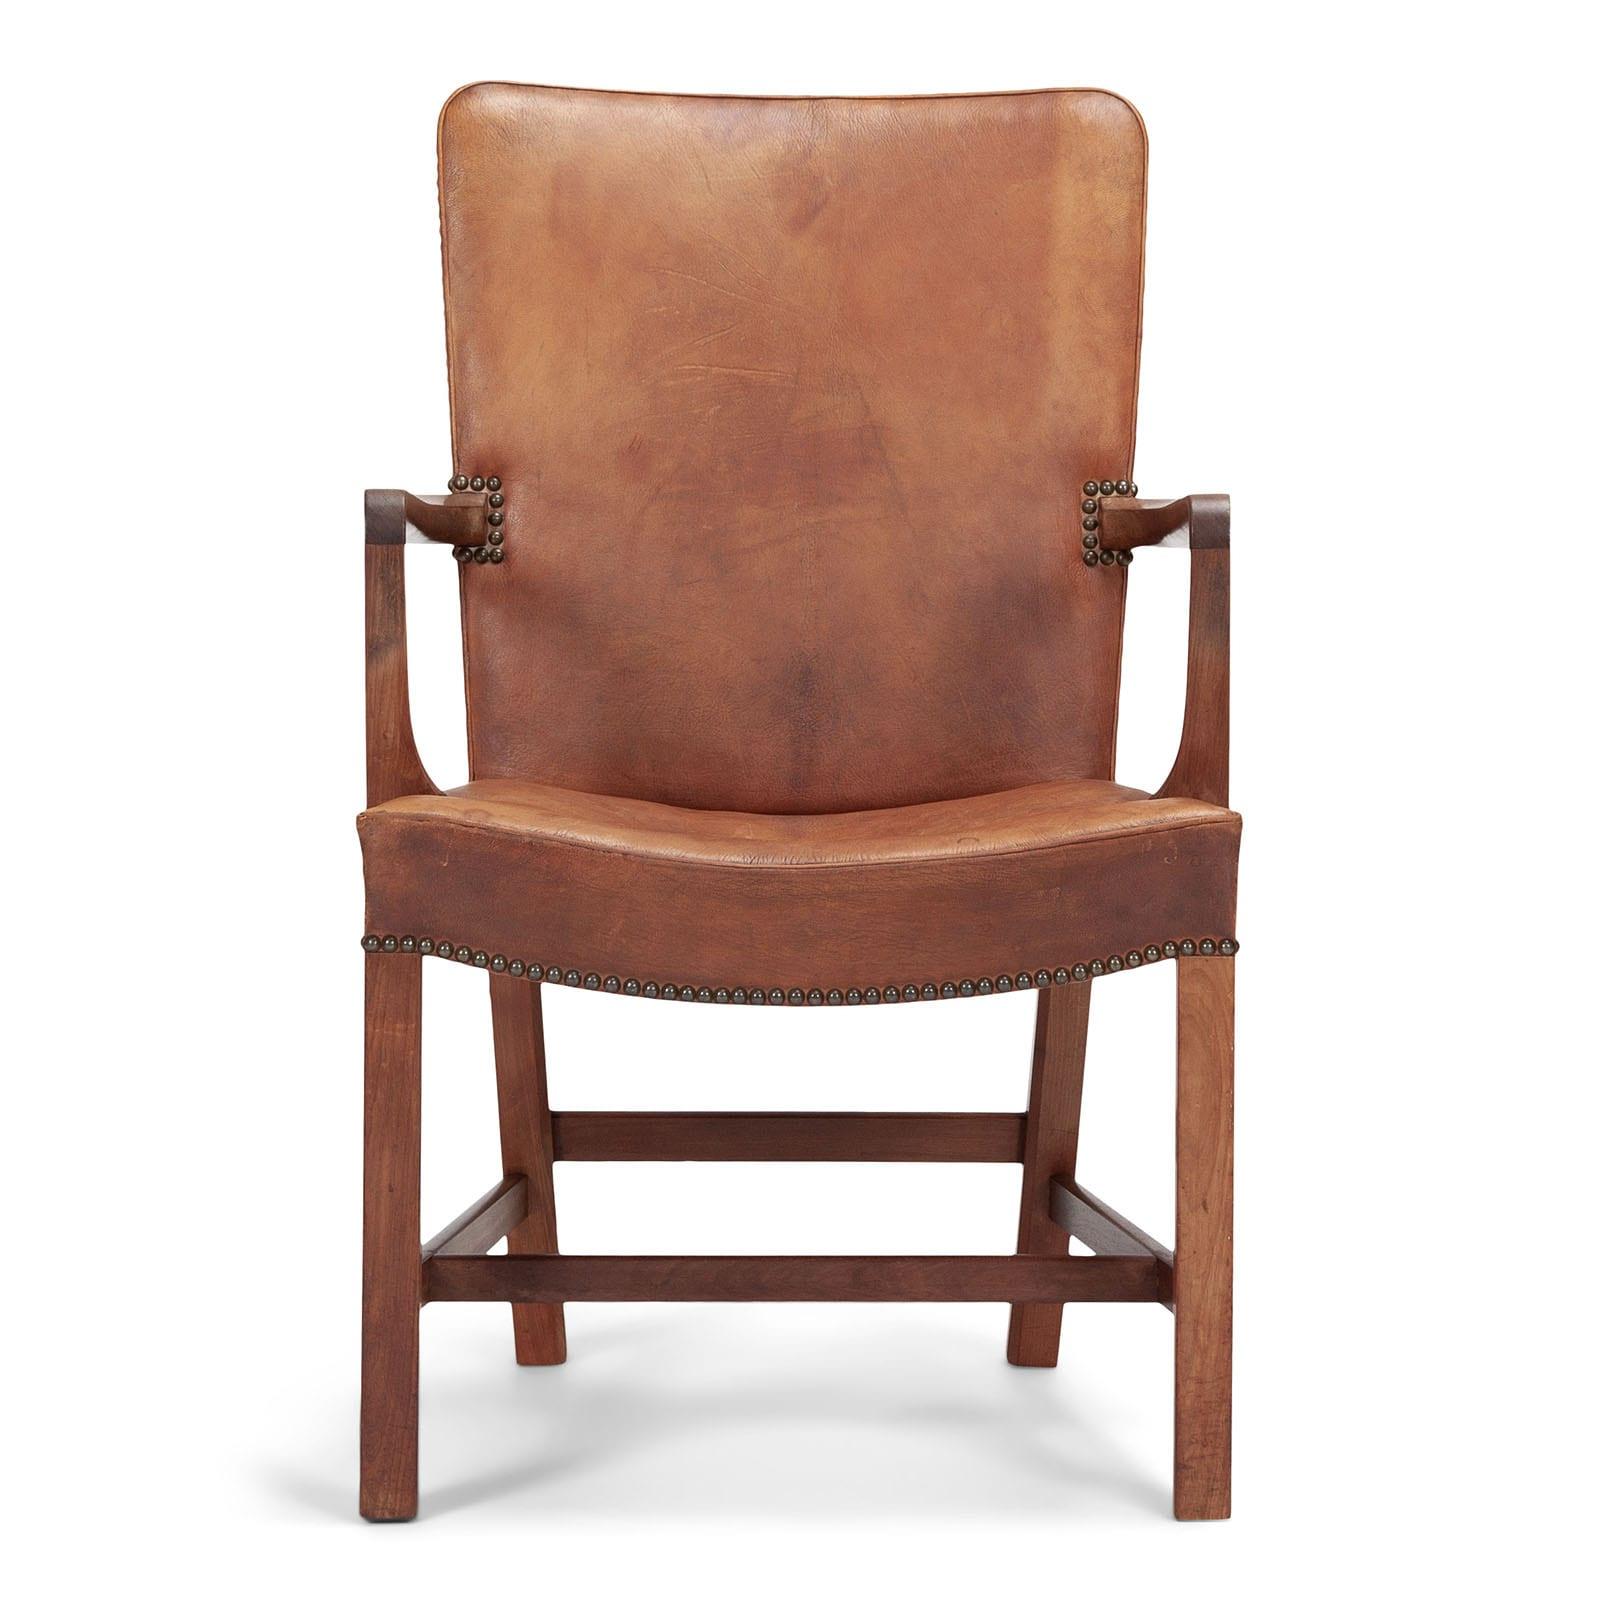 'Nørrevold' armchair model no. 5999